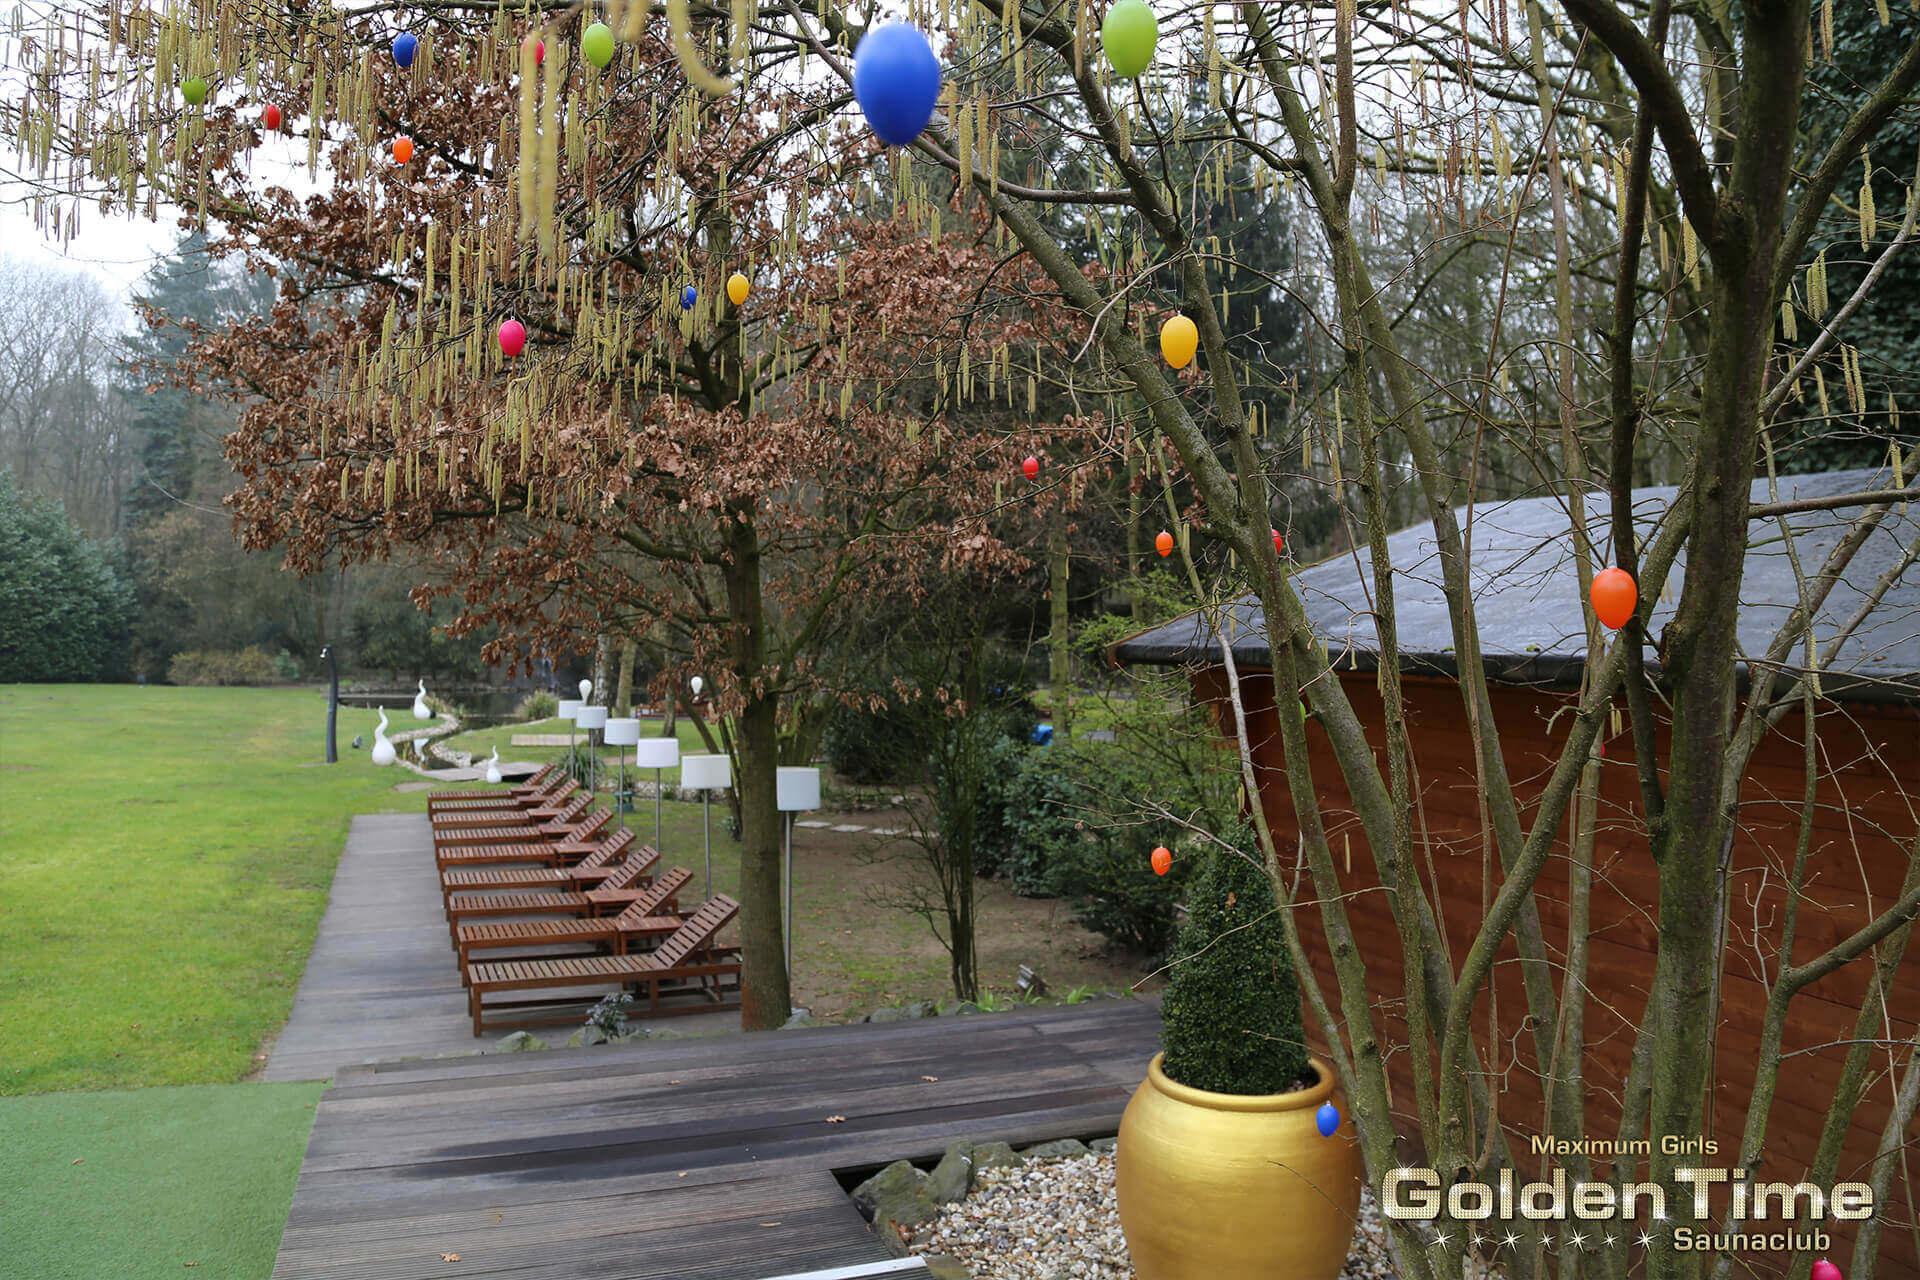 02-ostern-2016-pic-04-goldentime-saunaclub.jpg